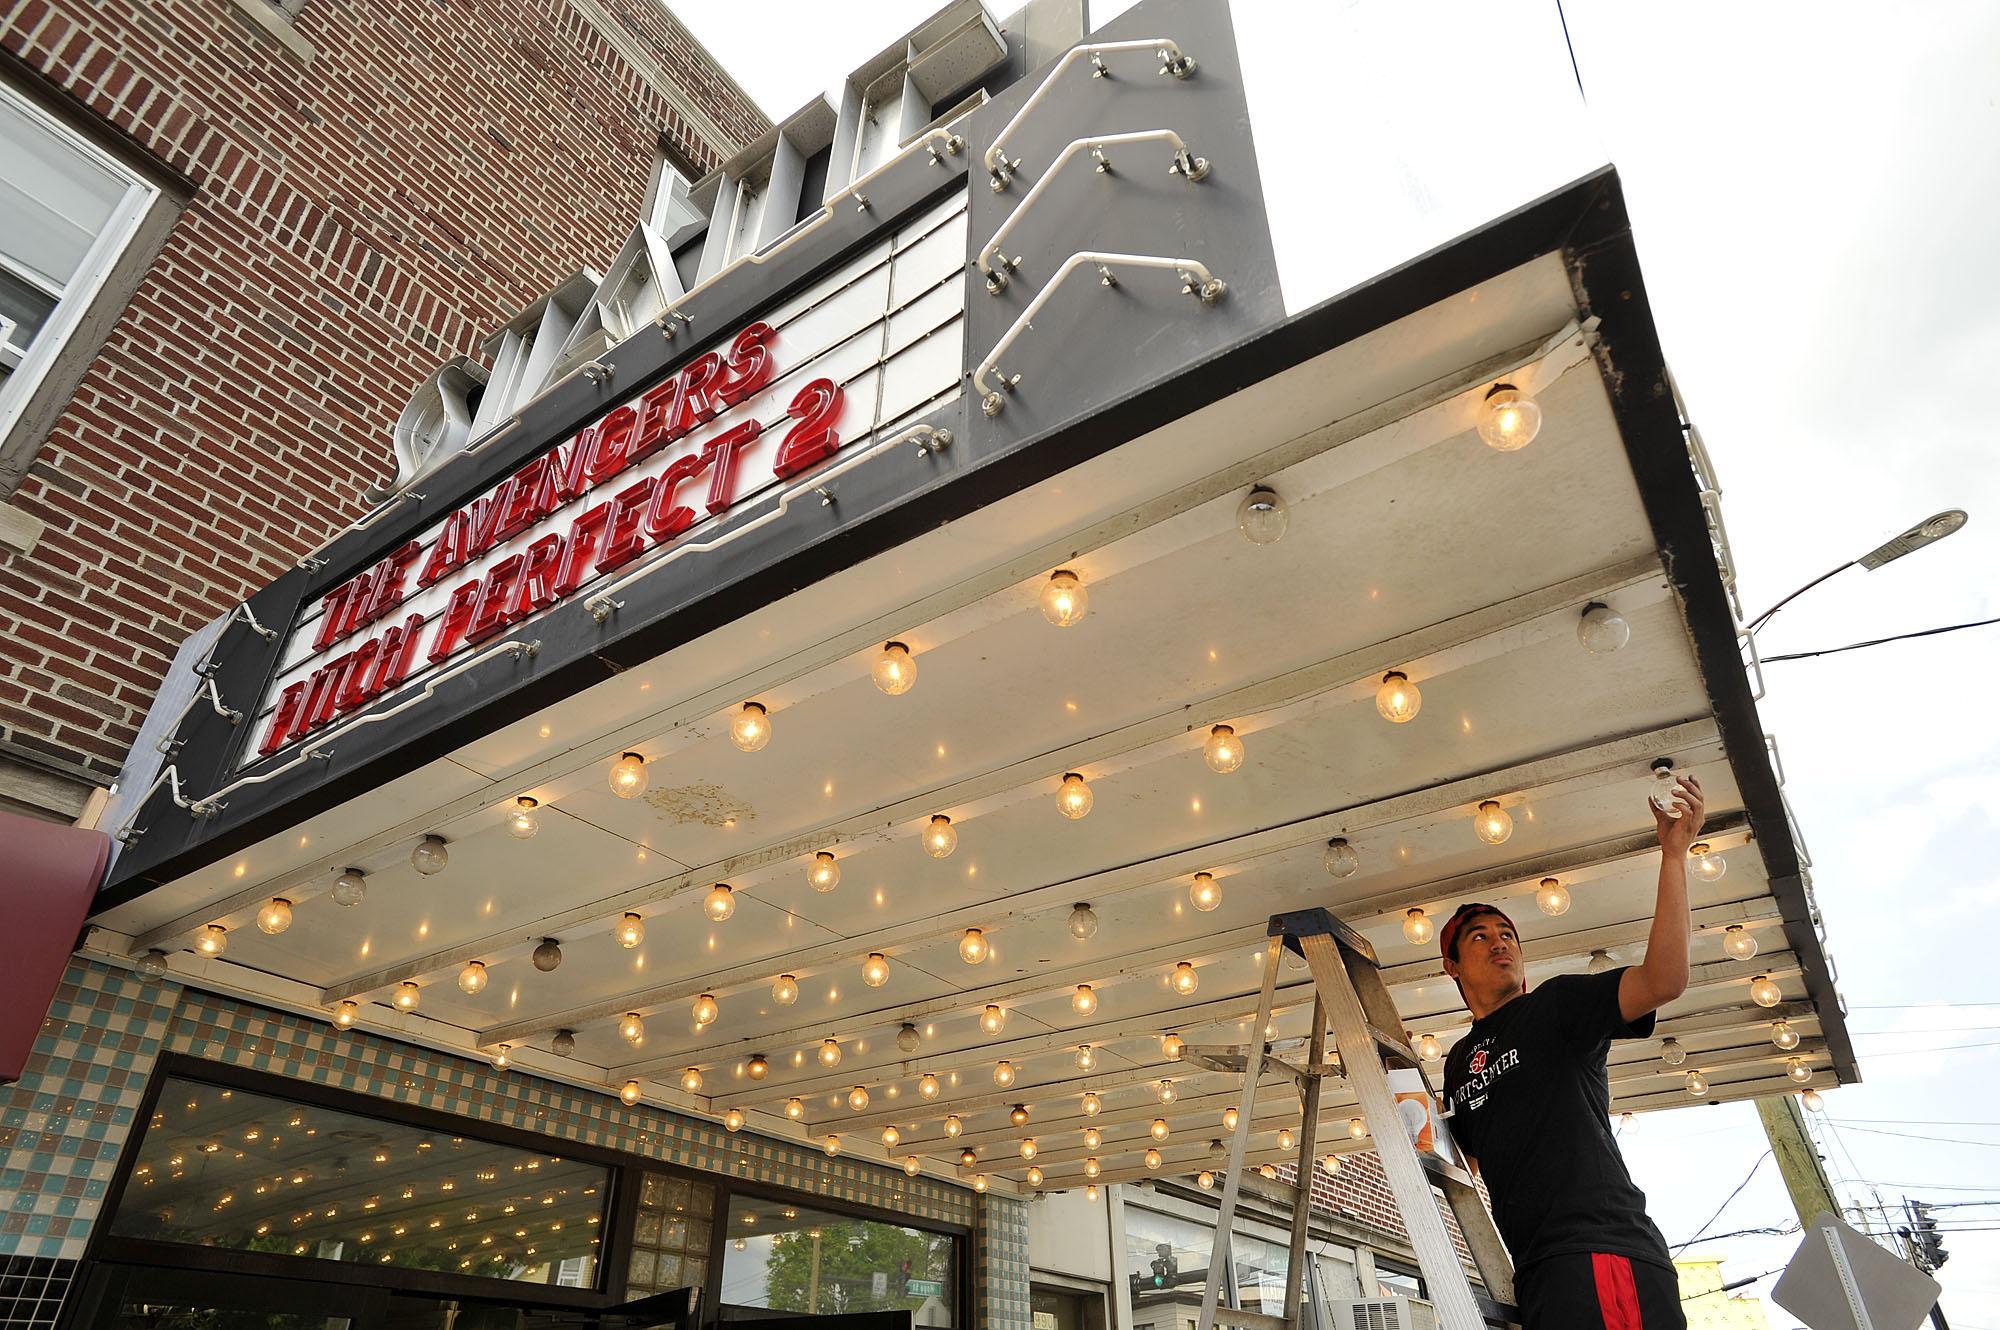 State Cinema to close - StamfordAdvocate